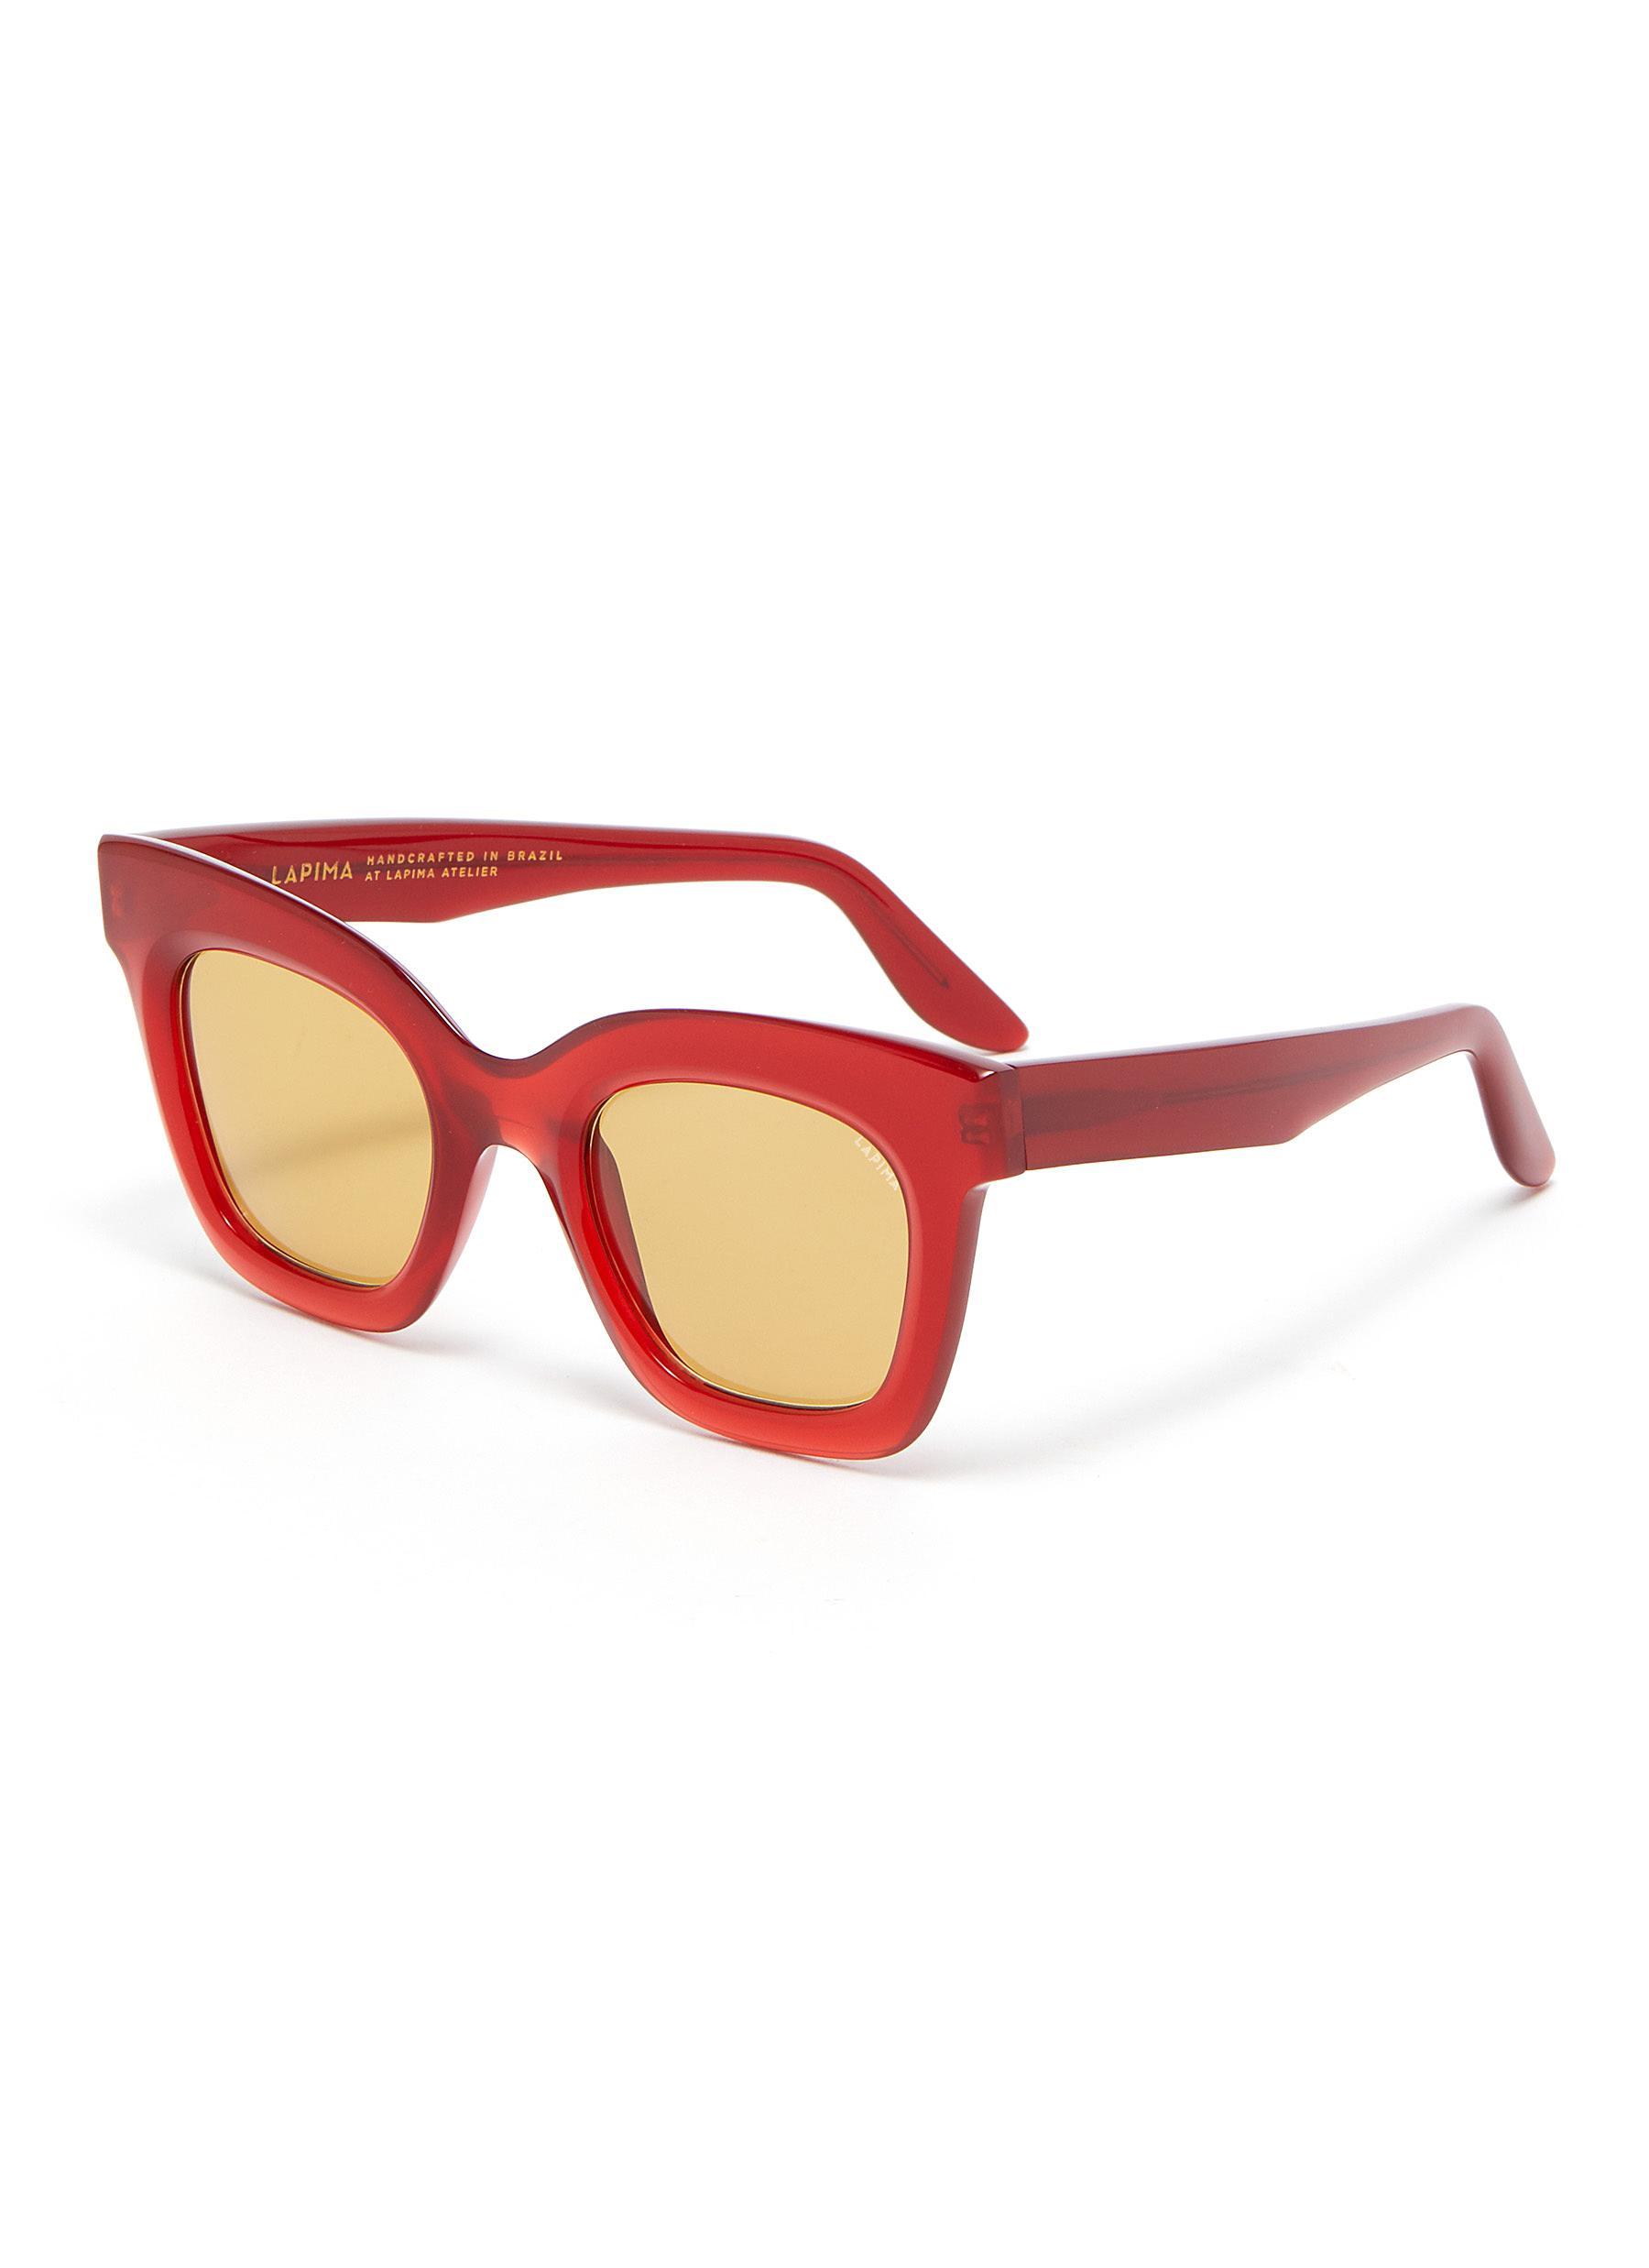 'Lisa' wayfarer acetate frame sunglasses